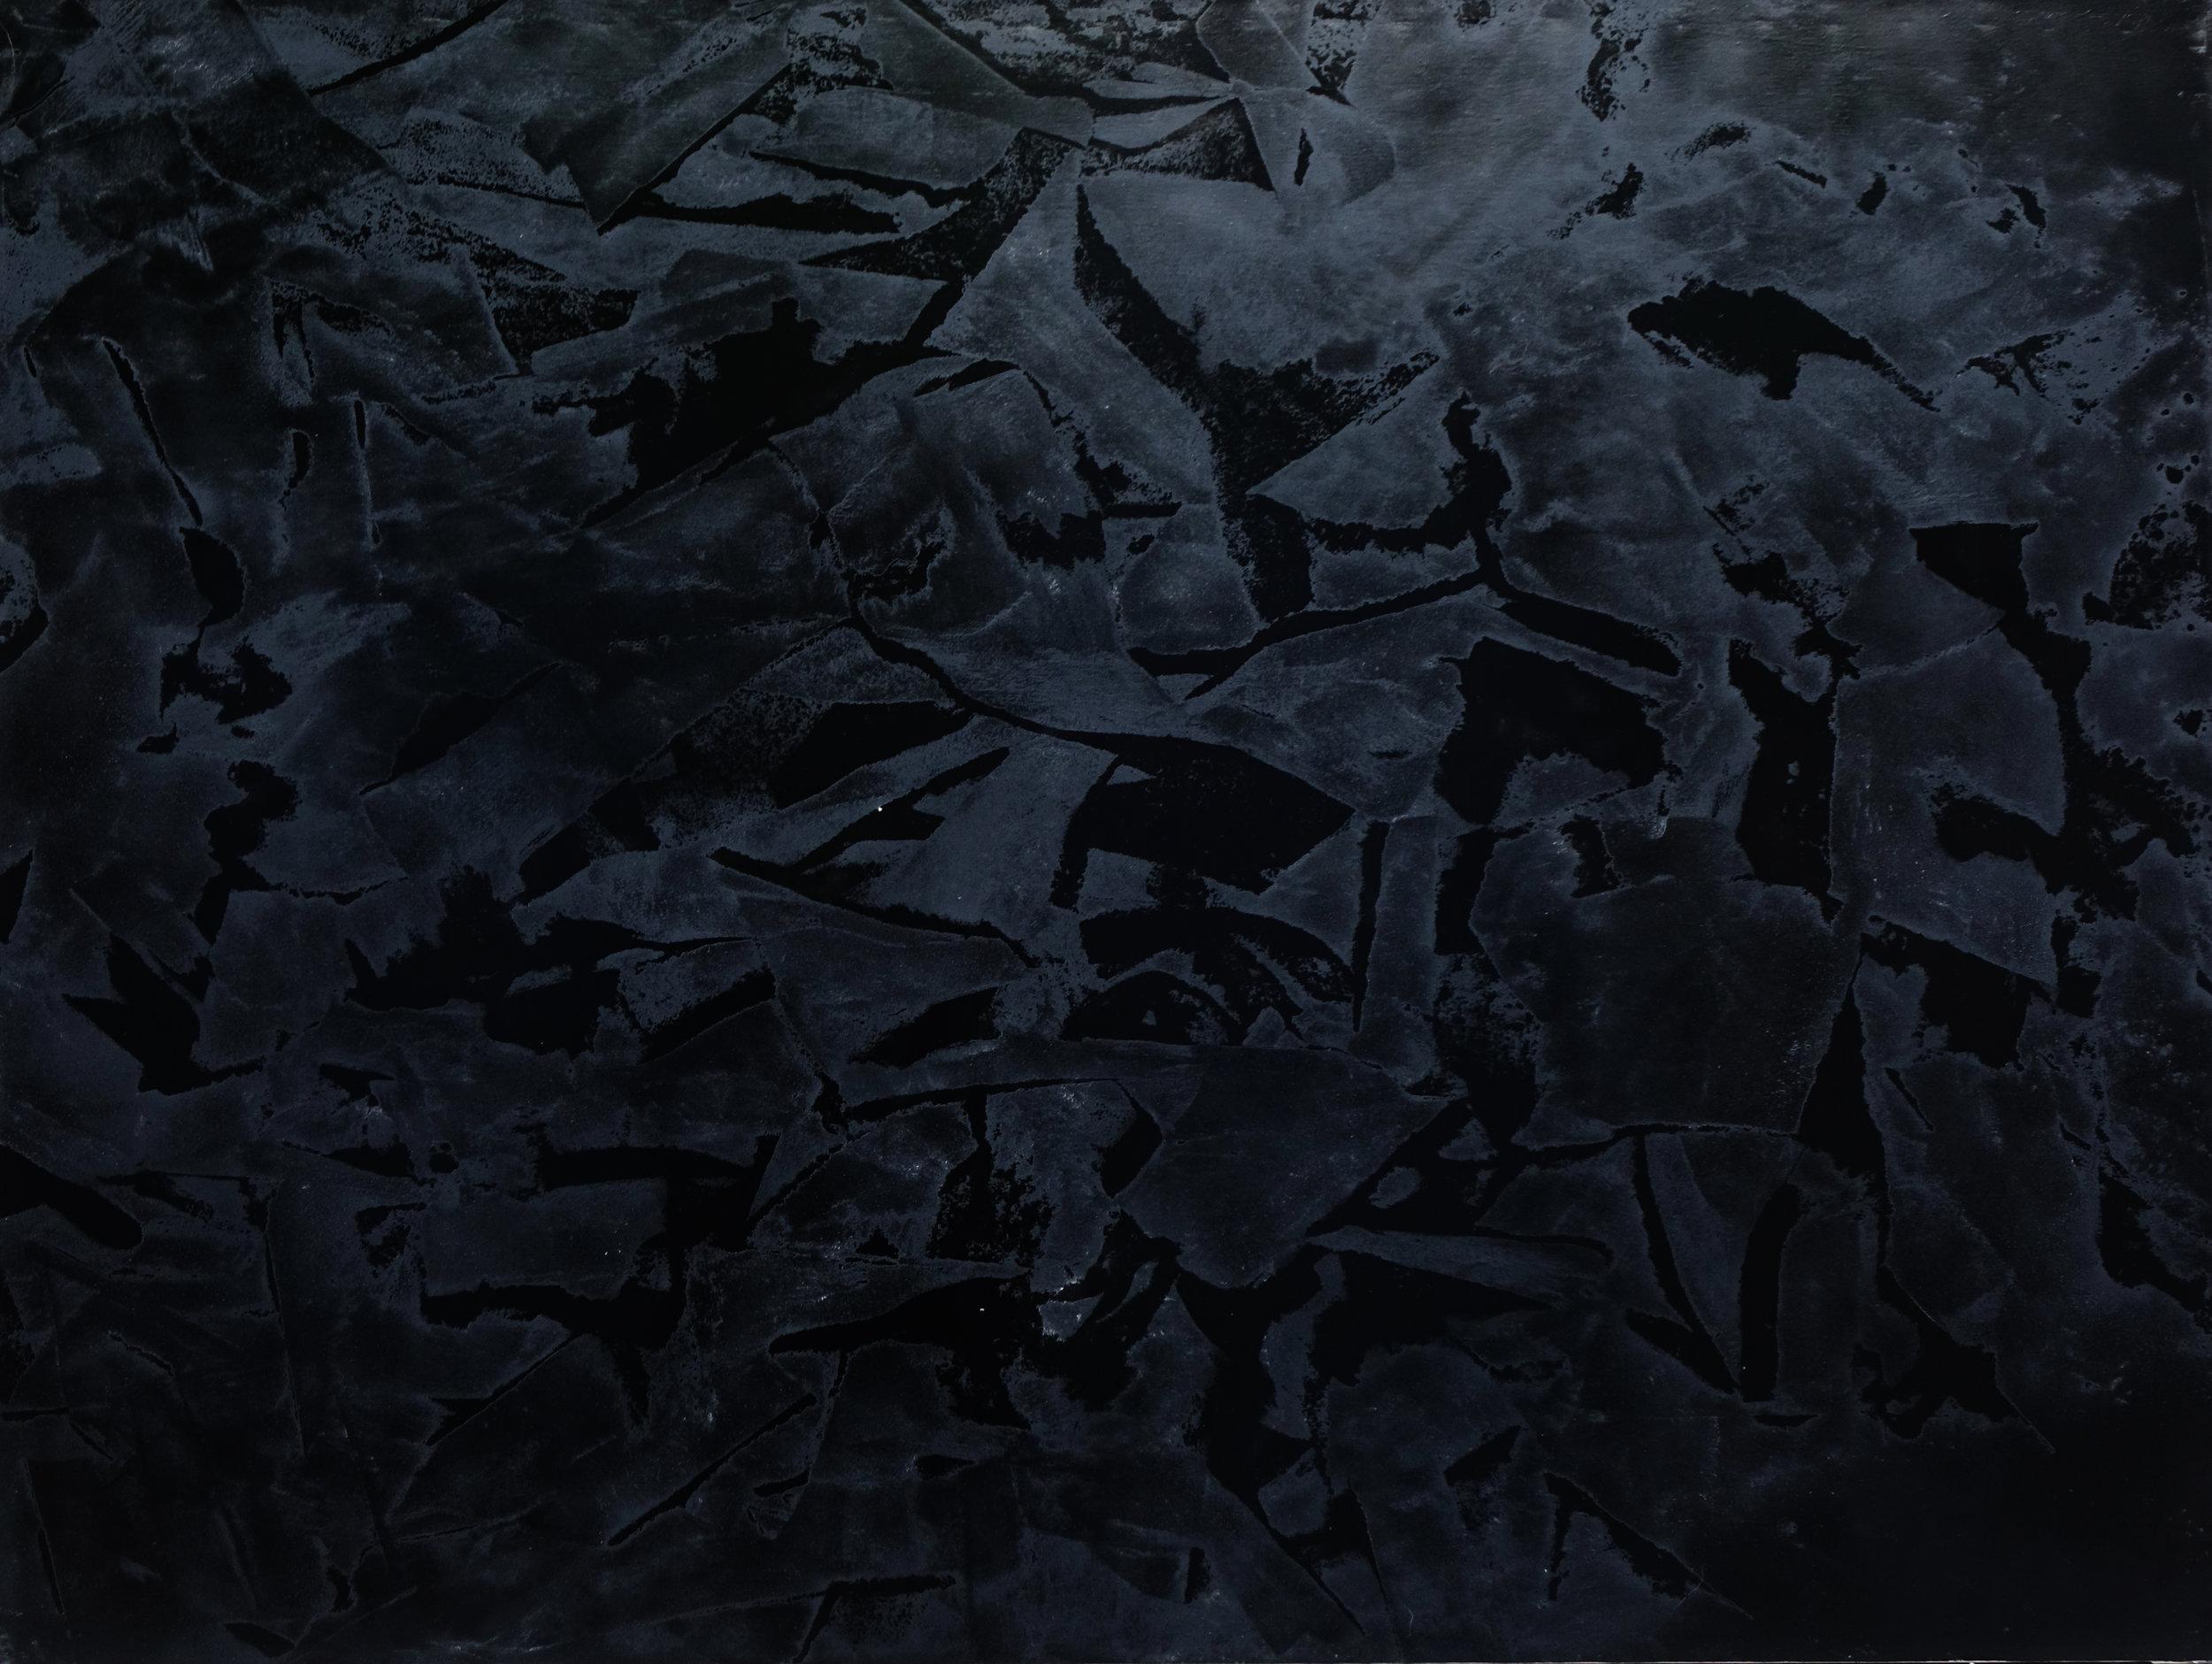 Black Void No. 19, 2017, 259cm x 194cm 200F, Oil on Canvas.jpg